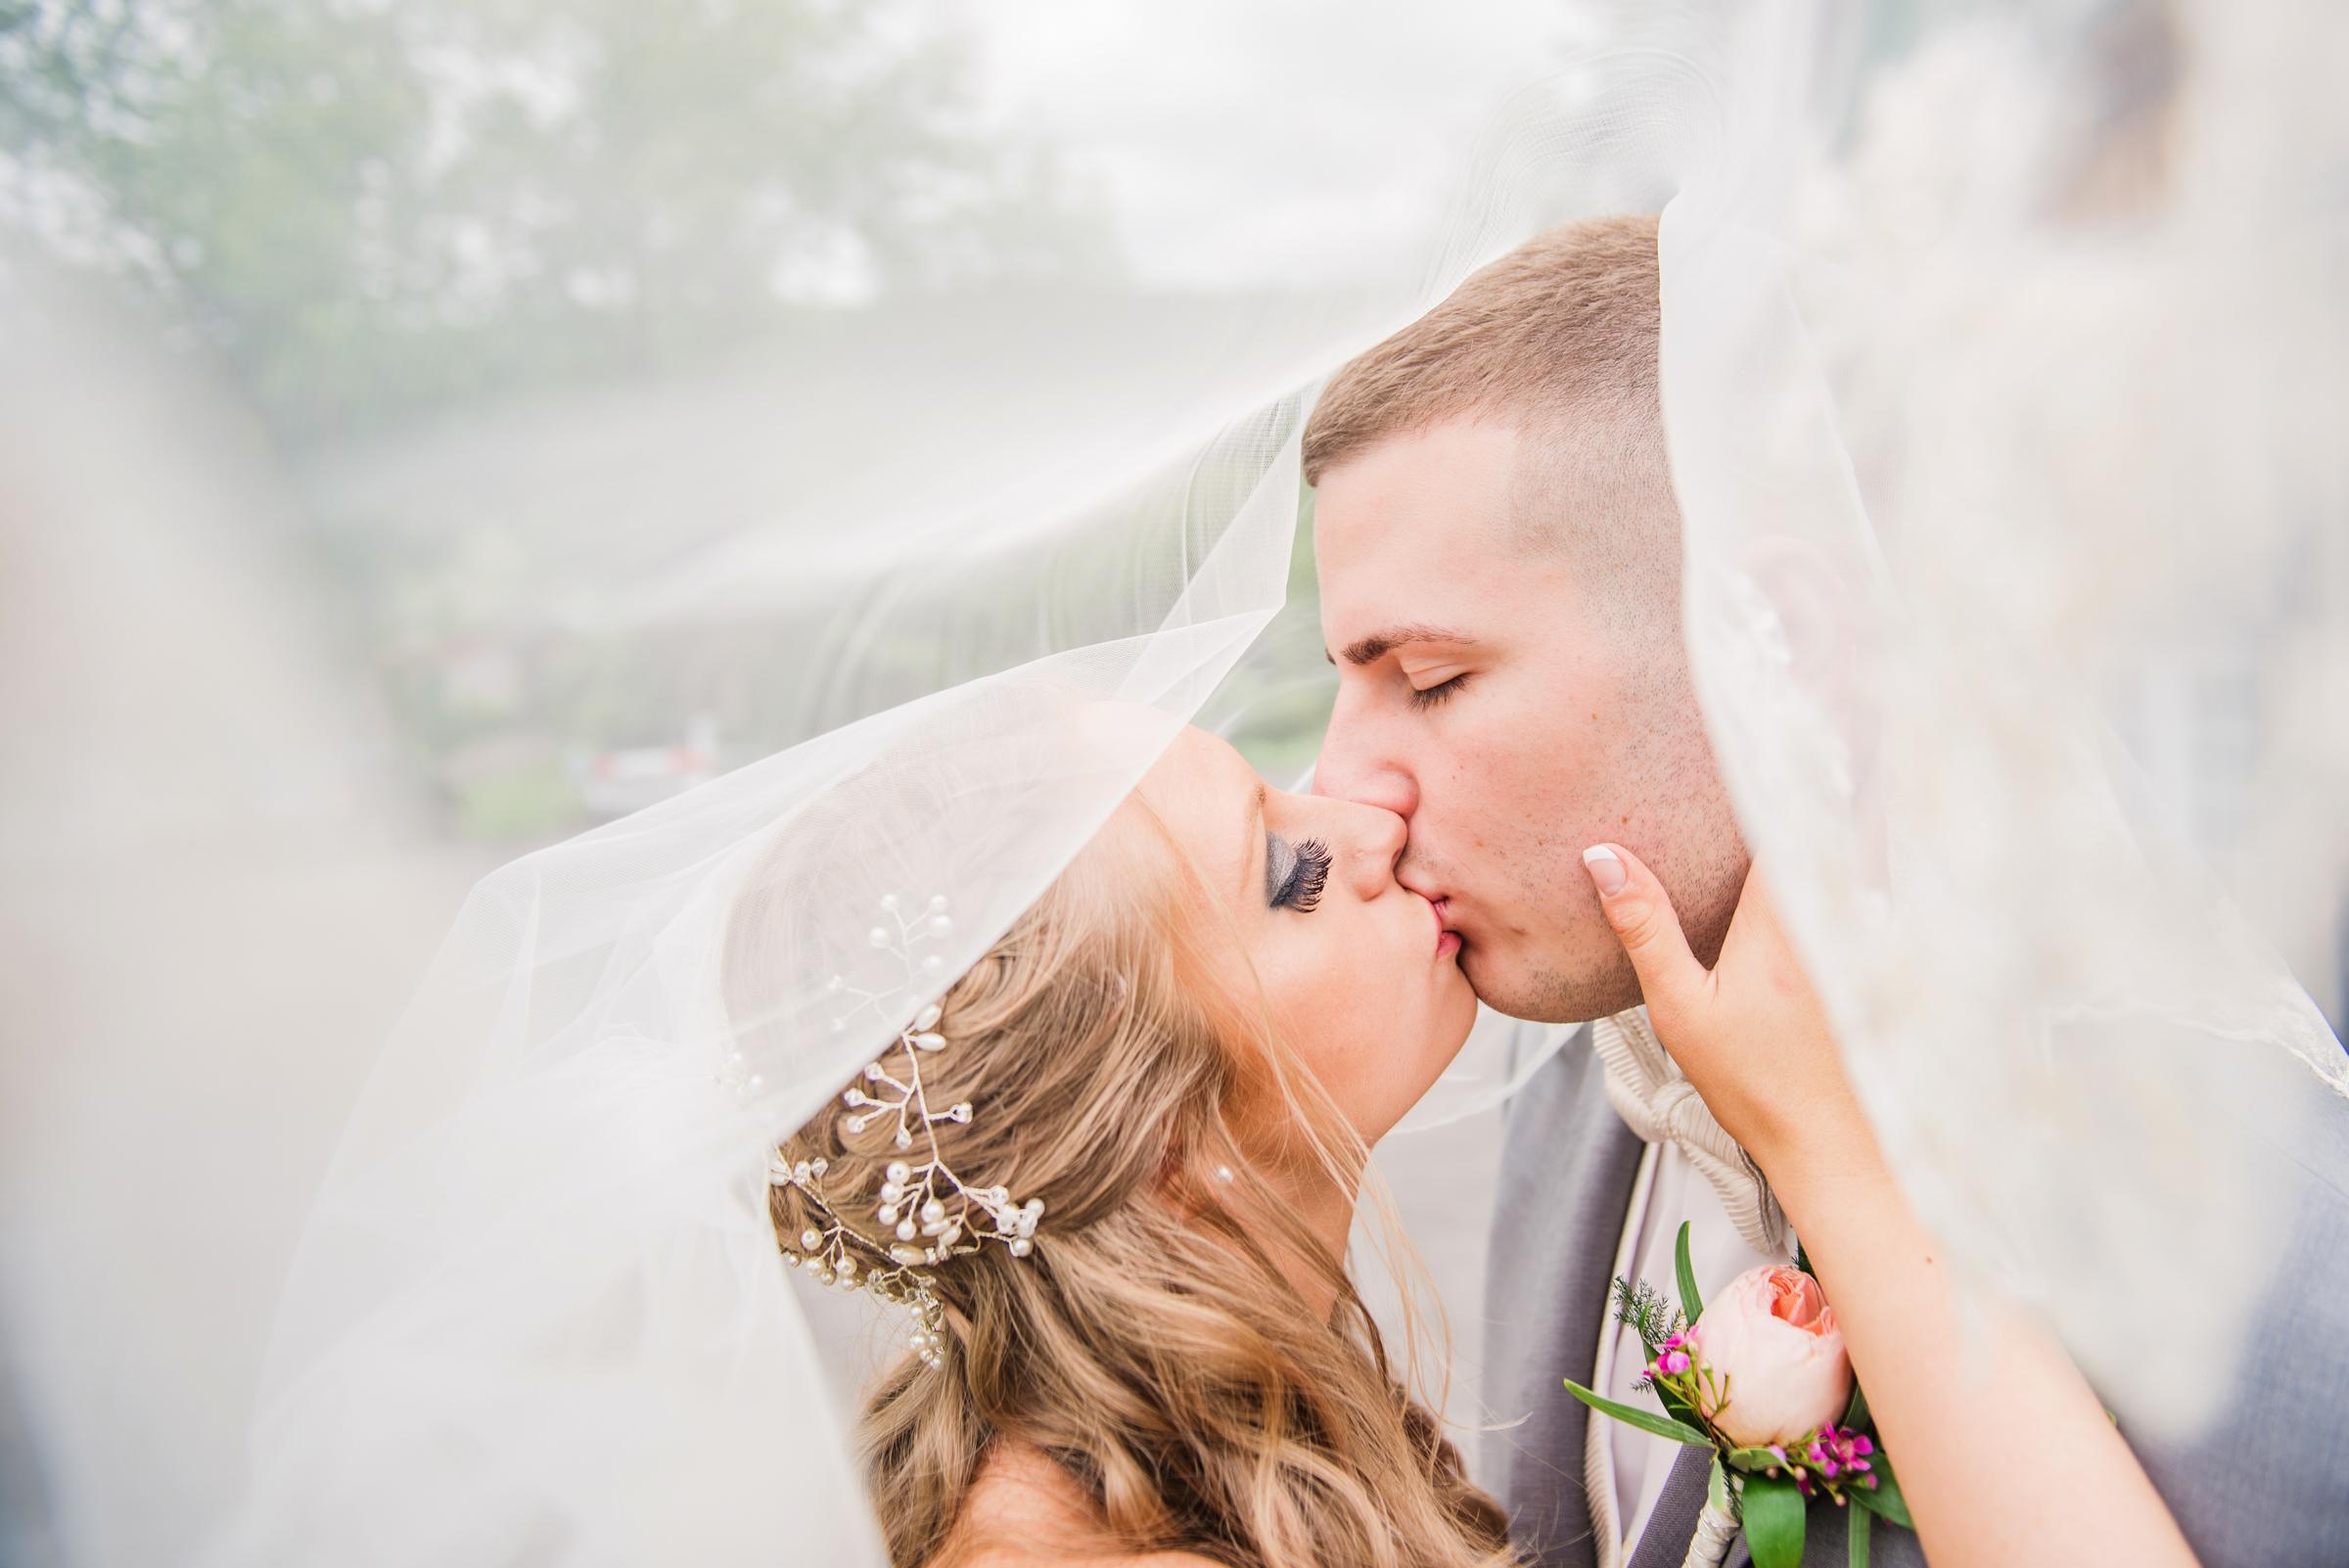 Wolf_Oak_Acres_Central_NY_Wedding_JILL_STUDIO_Rochester_NY_Photographer_DSC_8685.jpg